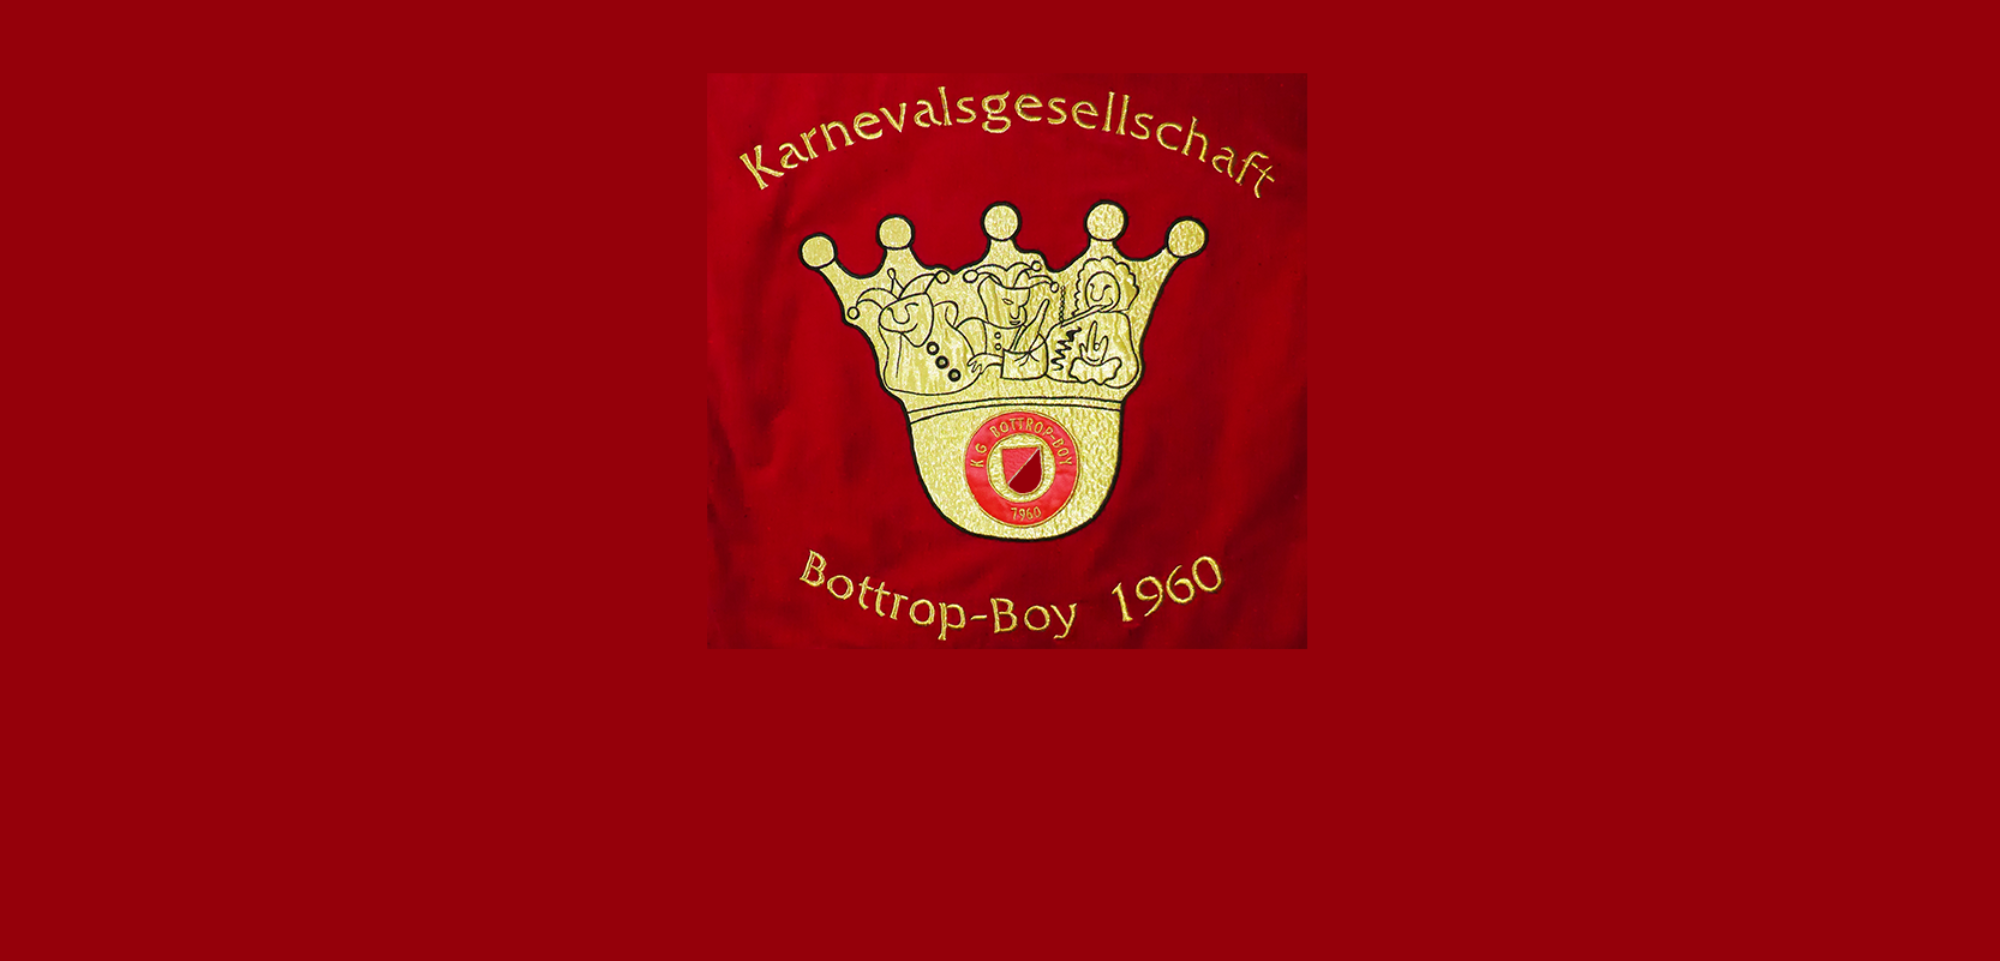 KG Bottrop Boy 1960 e. V.